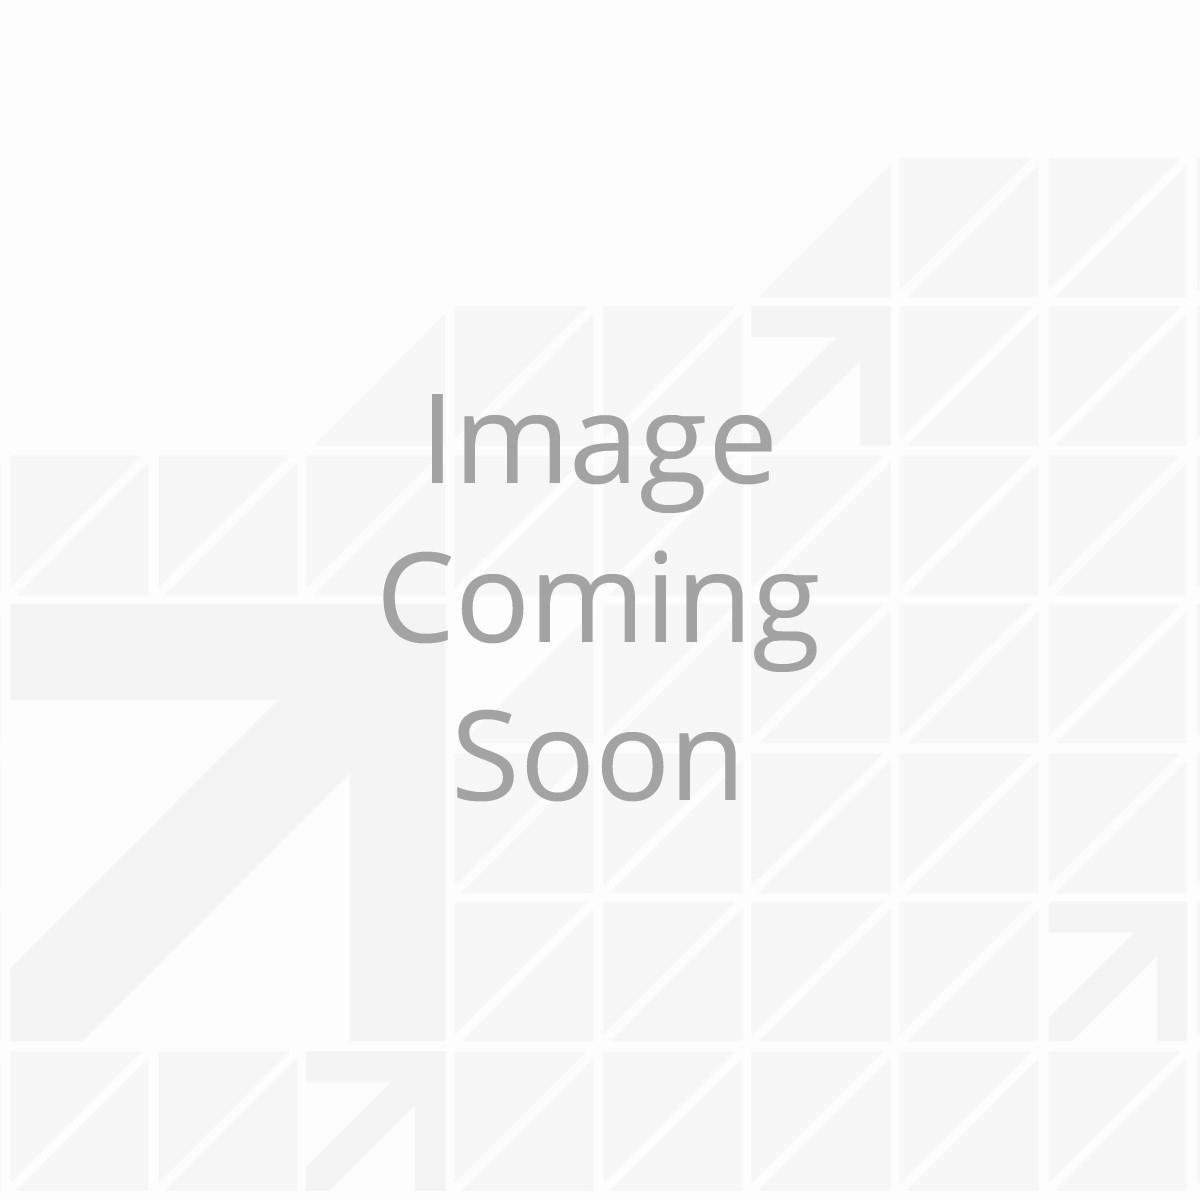 Thomas Payne® Adjustable Microfiber Sheet Set, White - Queen